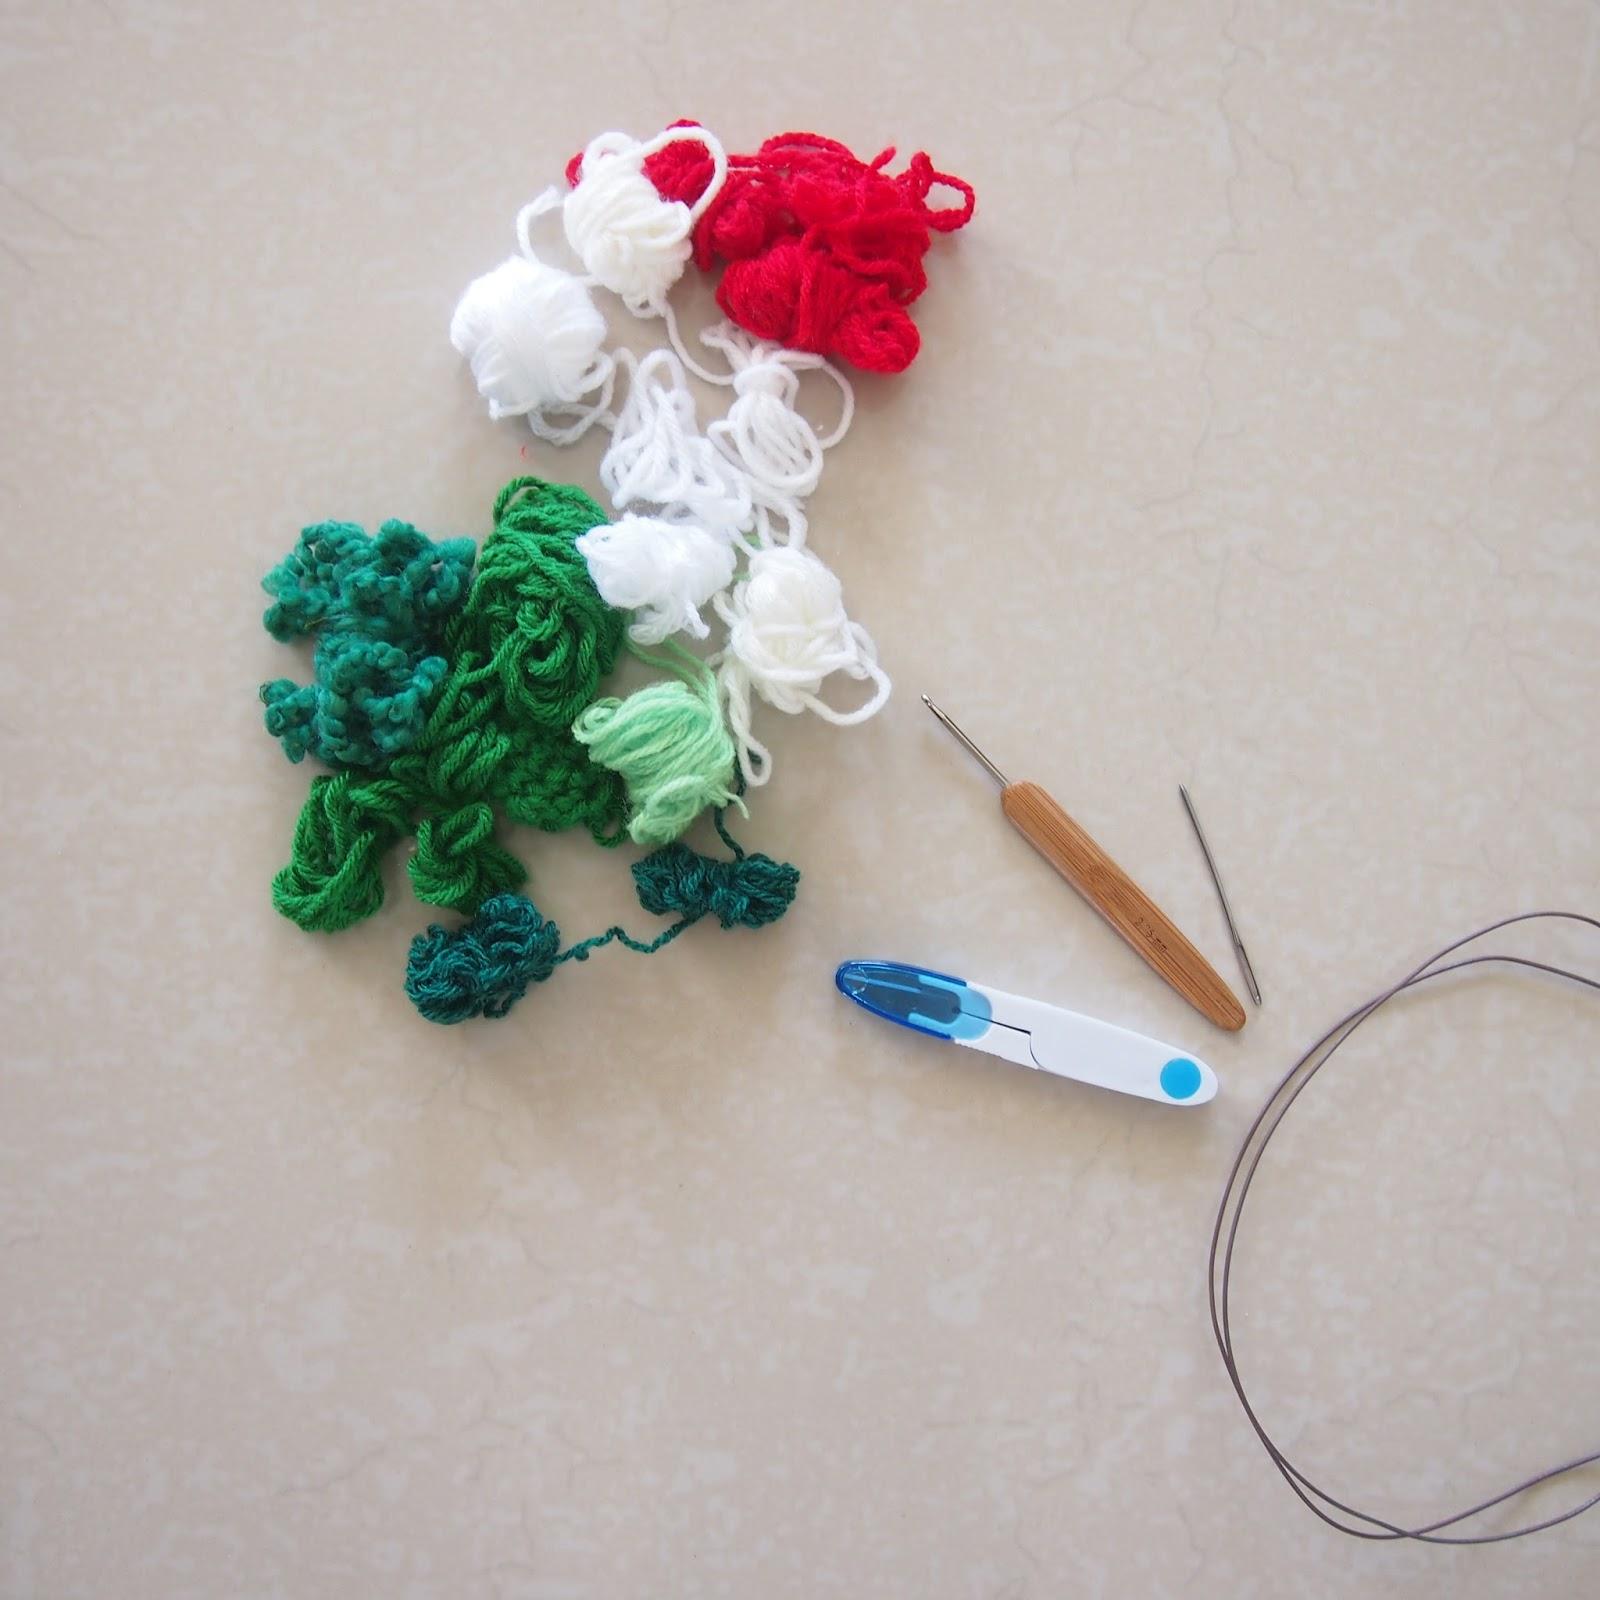 sol de noche deco crochet christmassy crochet word free. Black Bedroom Furniture Sets. Home Design Ideas